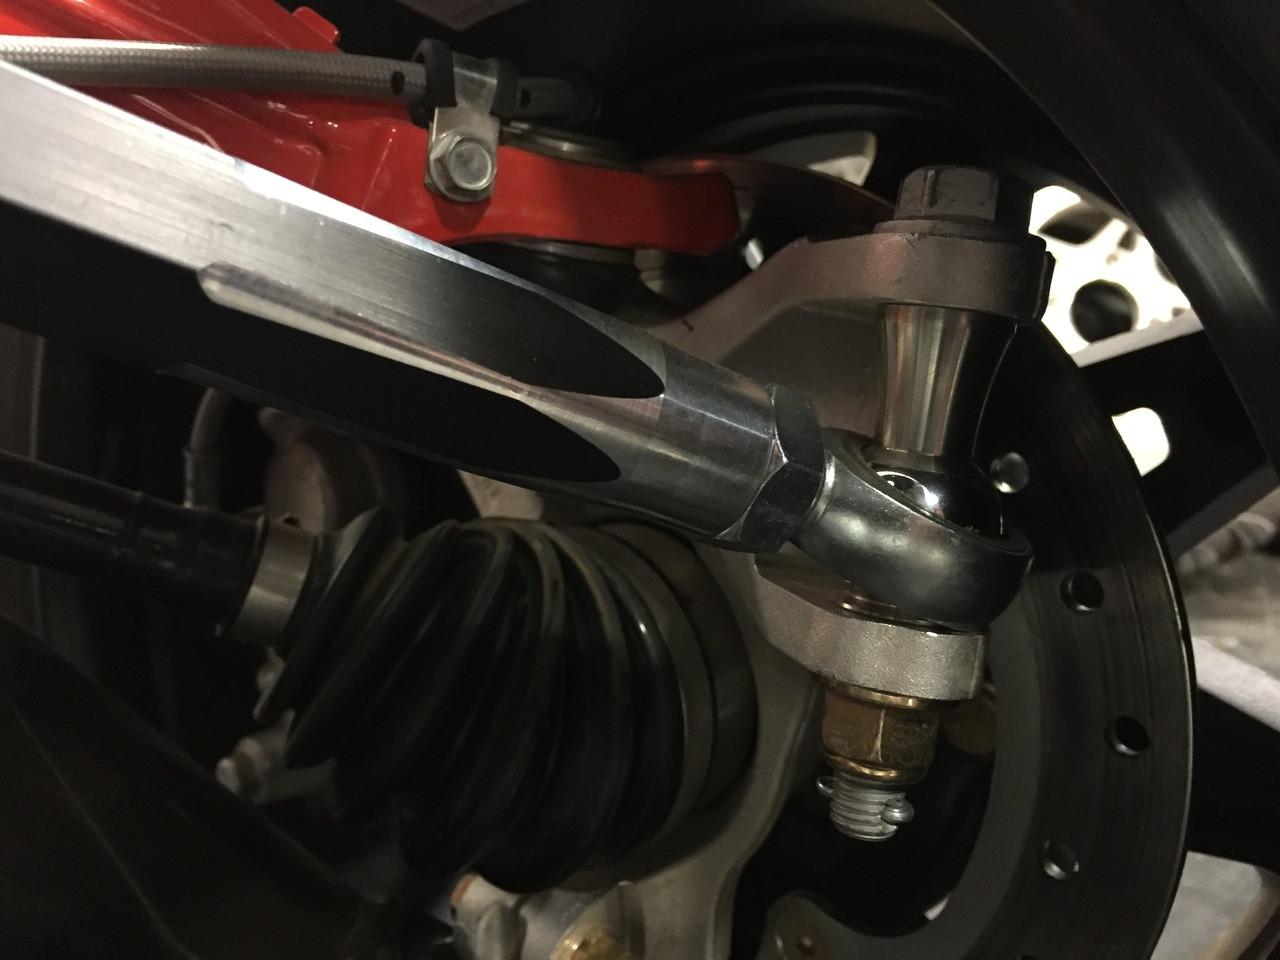 BSD Tie Rod kit installed (patent pending)